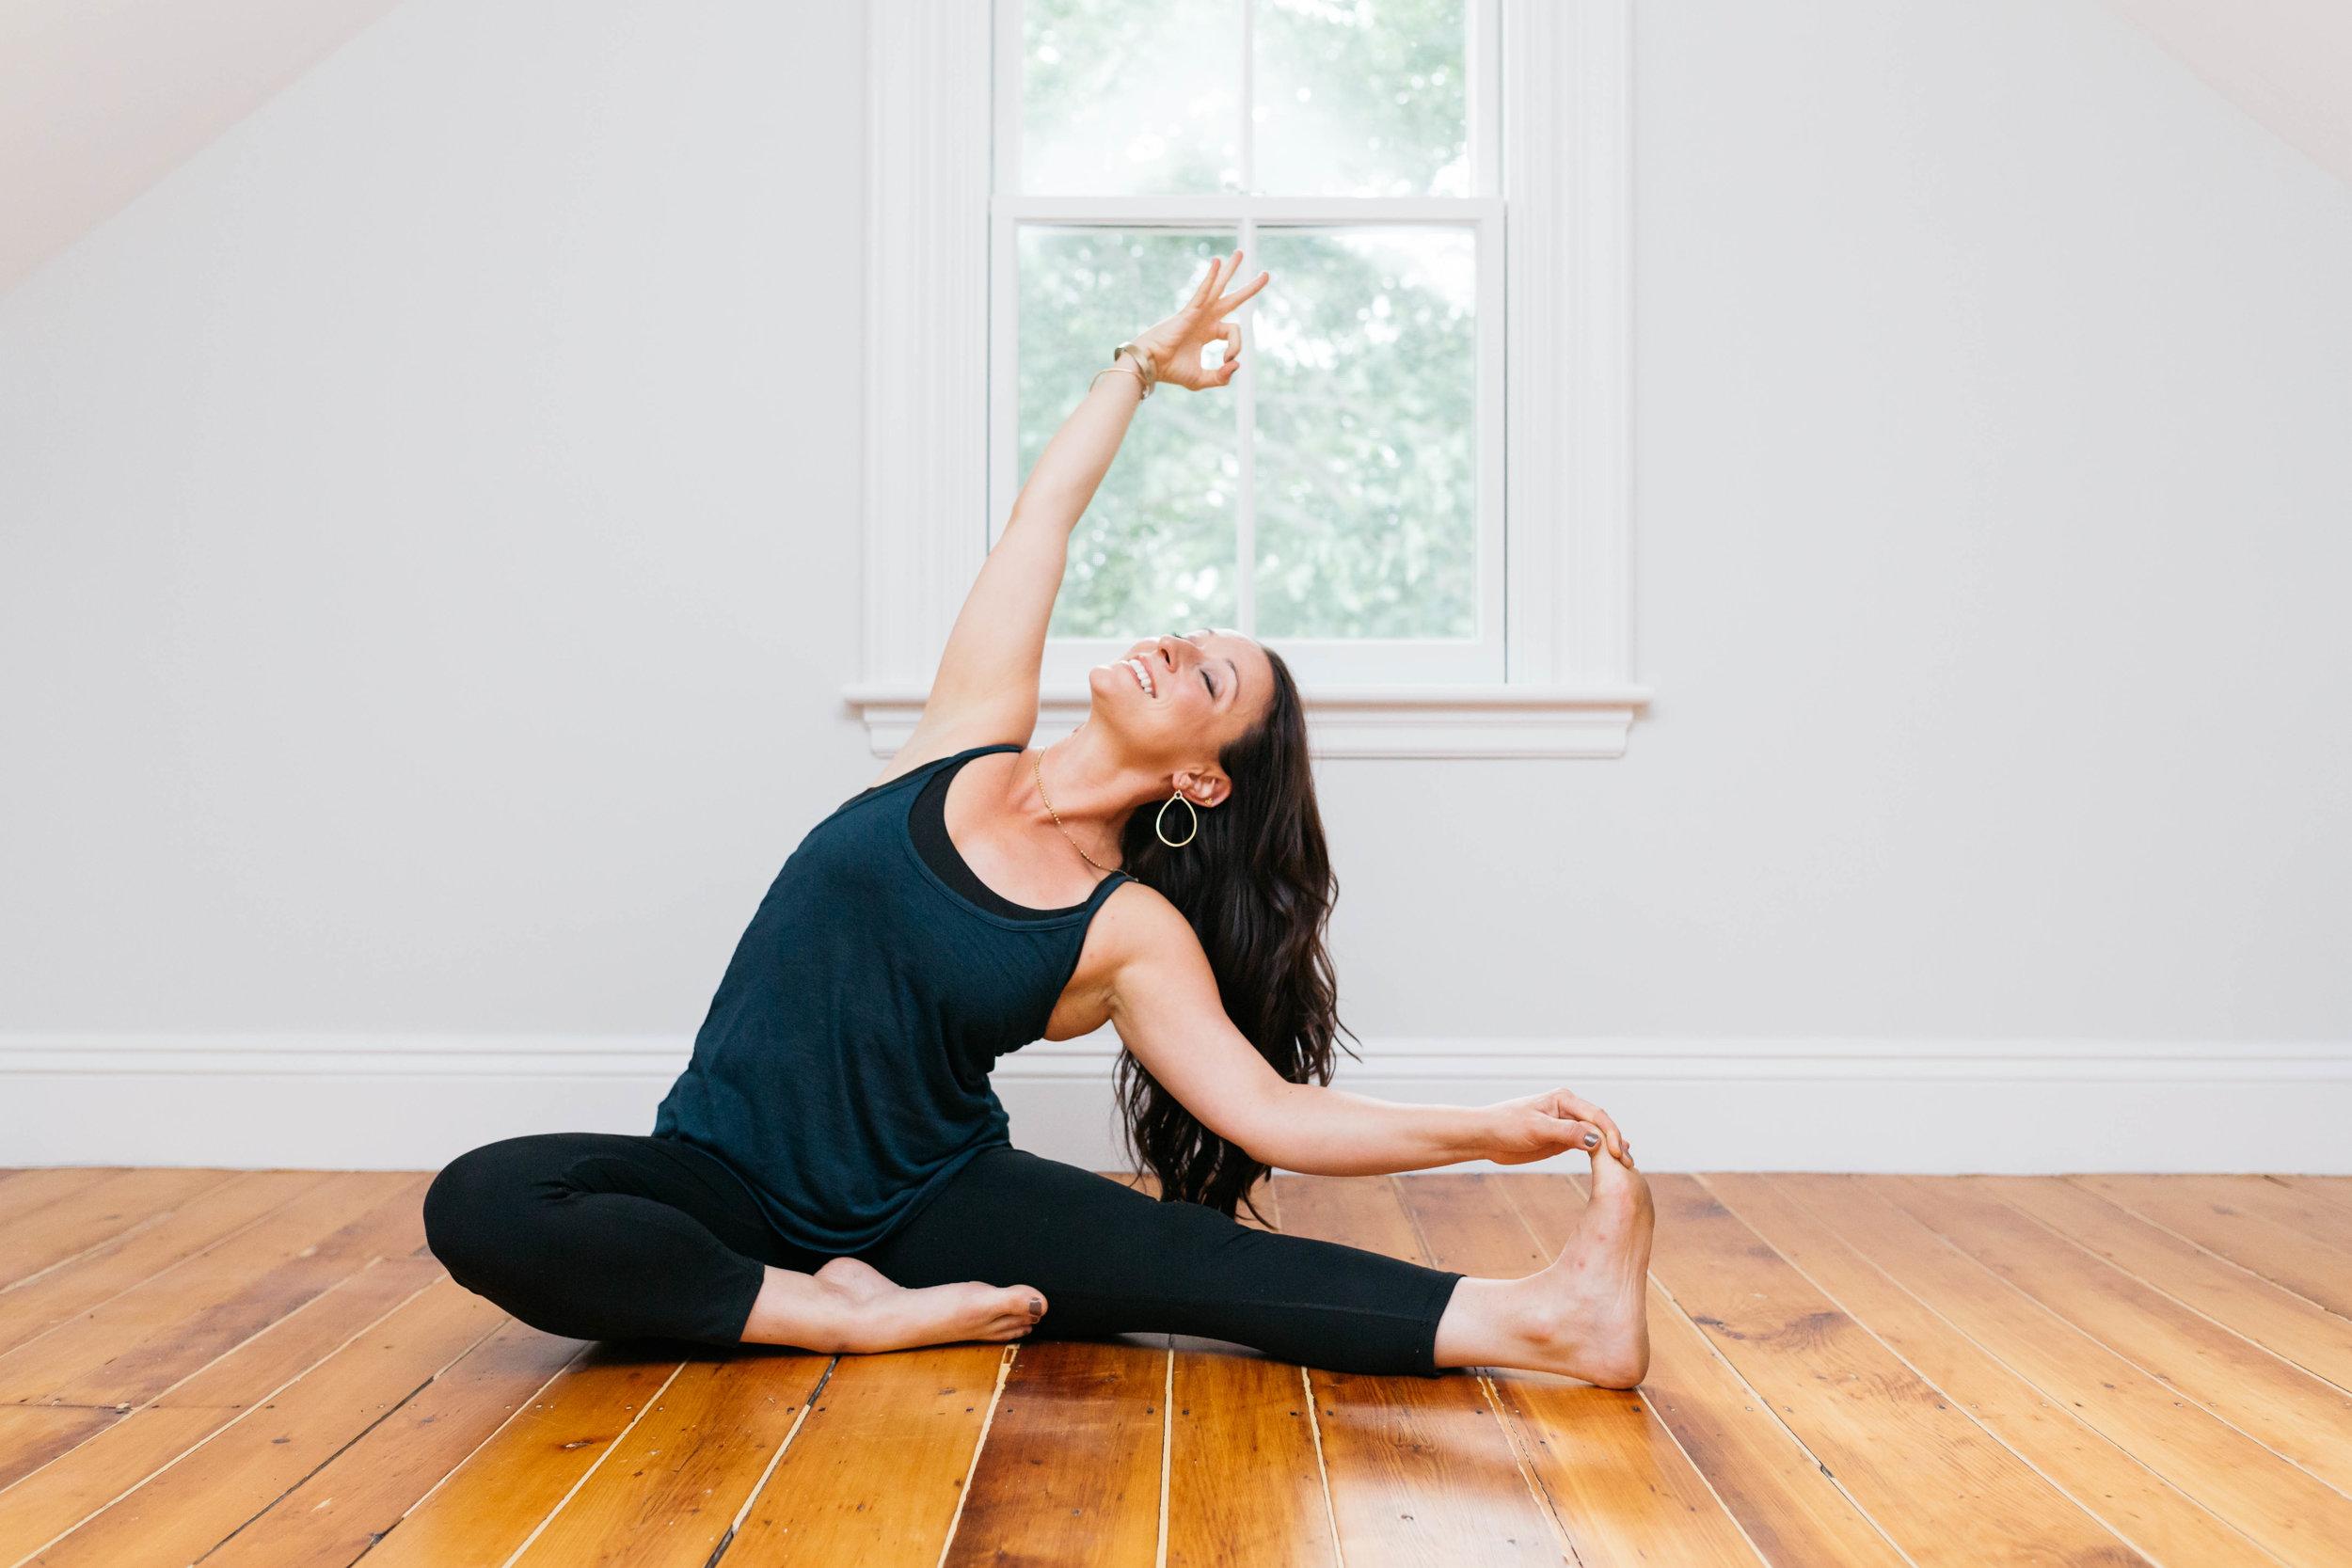 boston-yoga-photographer-christyn-11.jpg